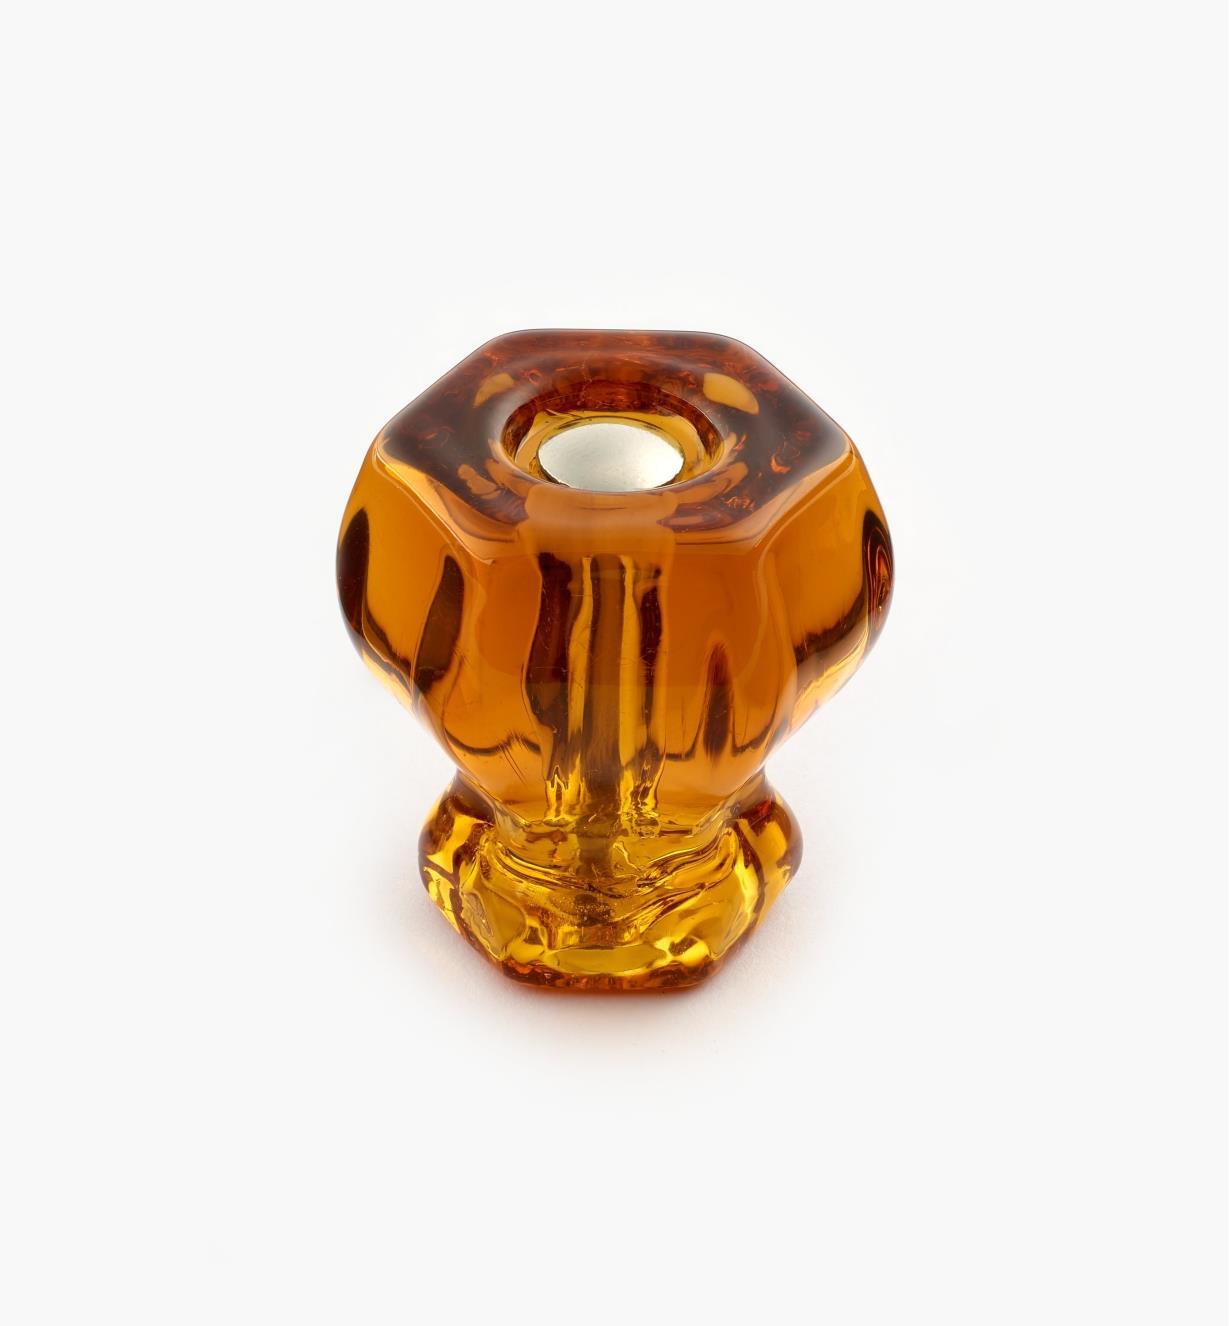 01A3730 - Bouton hexagonal en verre, ambre, 11/8po